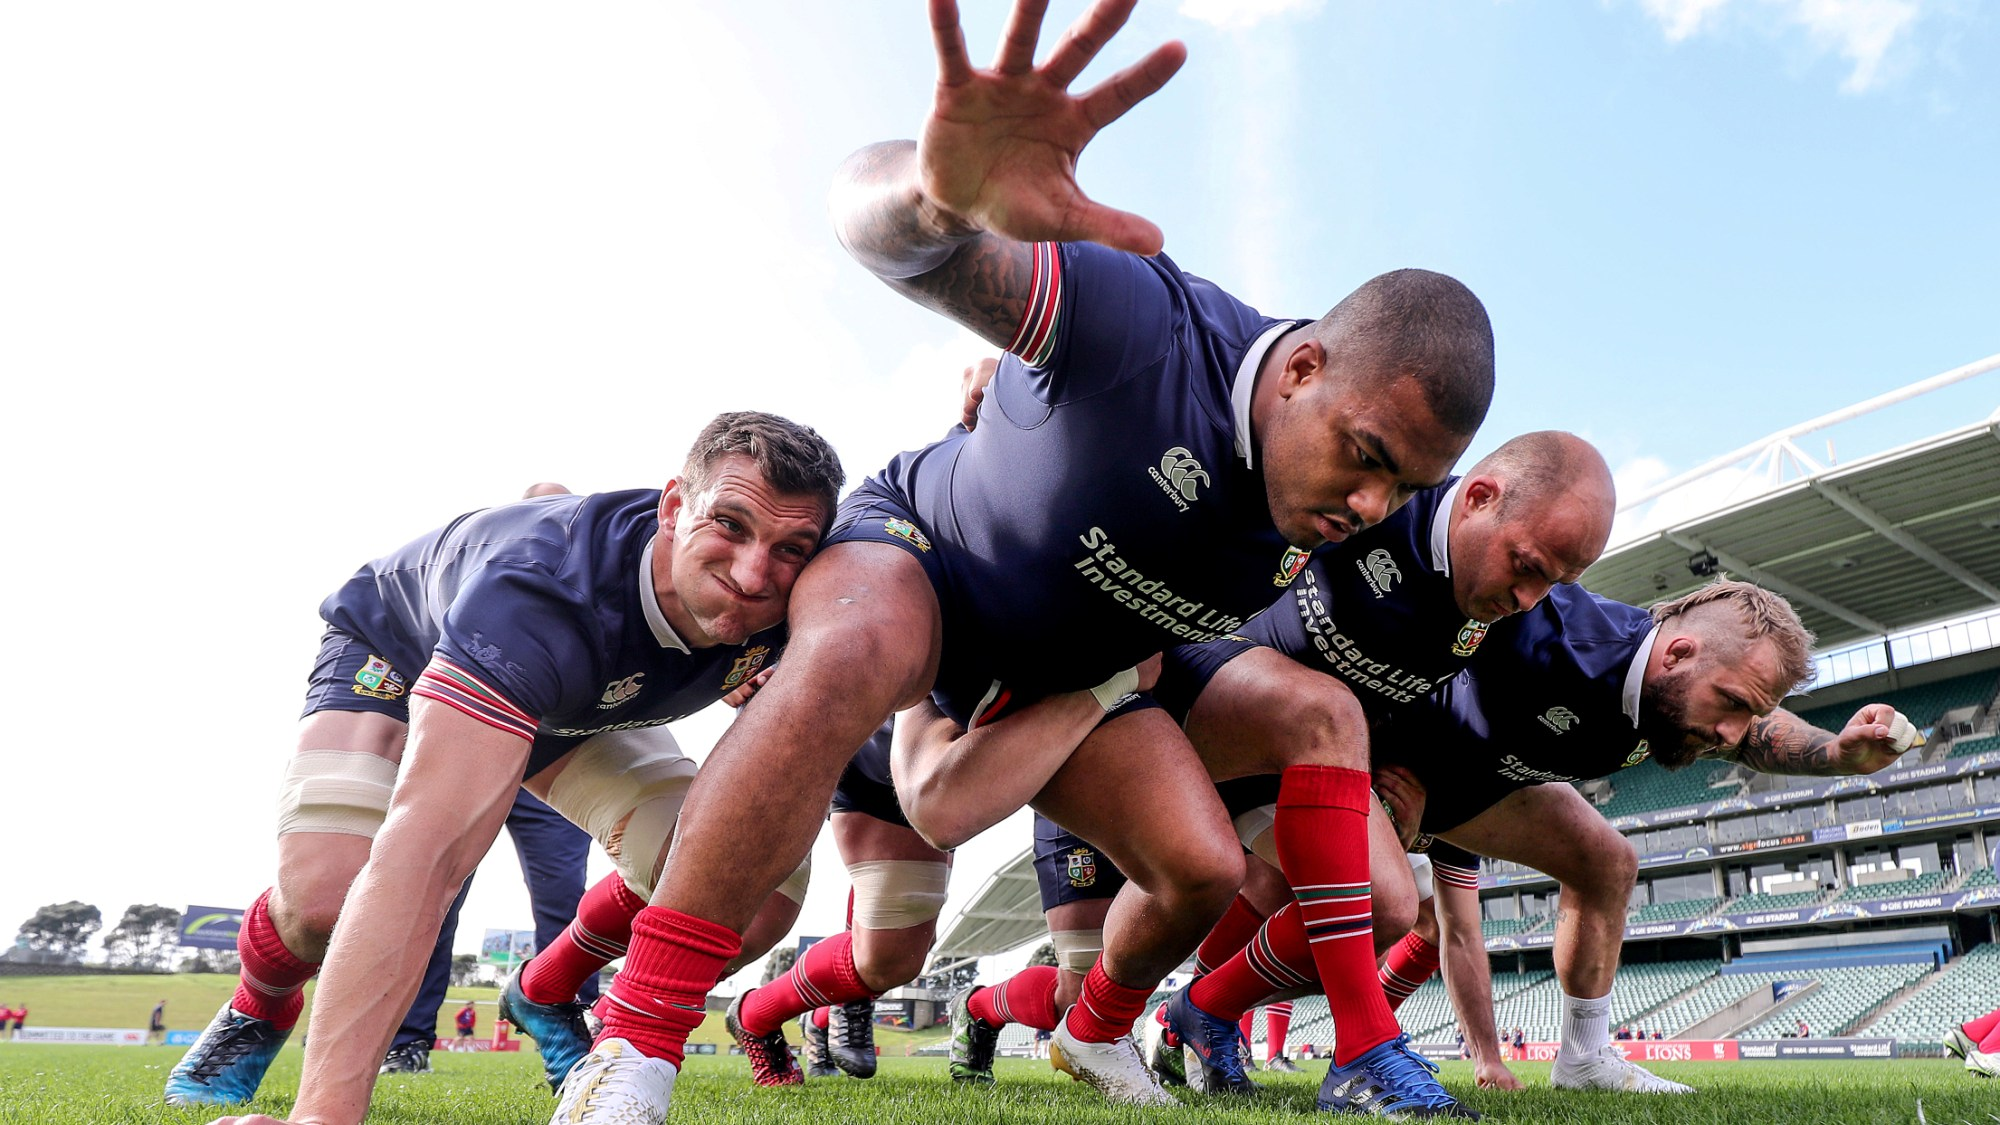 Sinckler in 'rugby heaven' before Lions debut